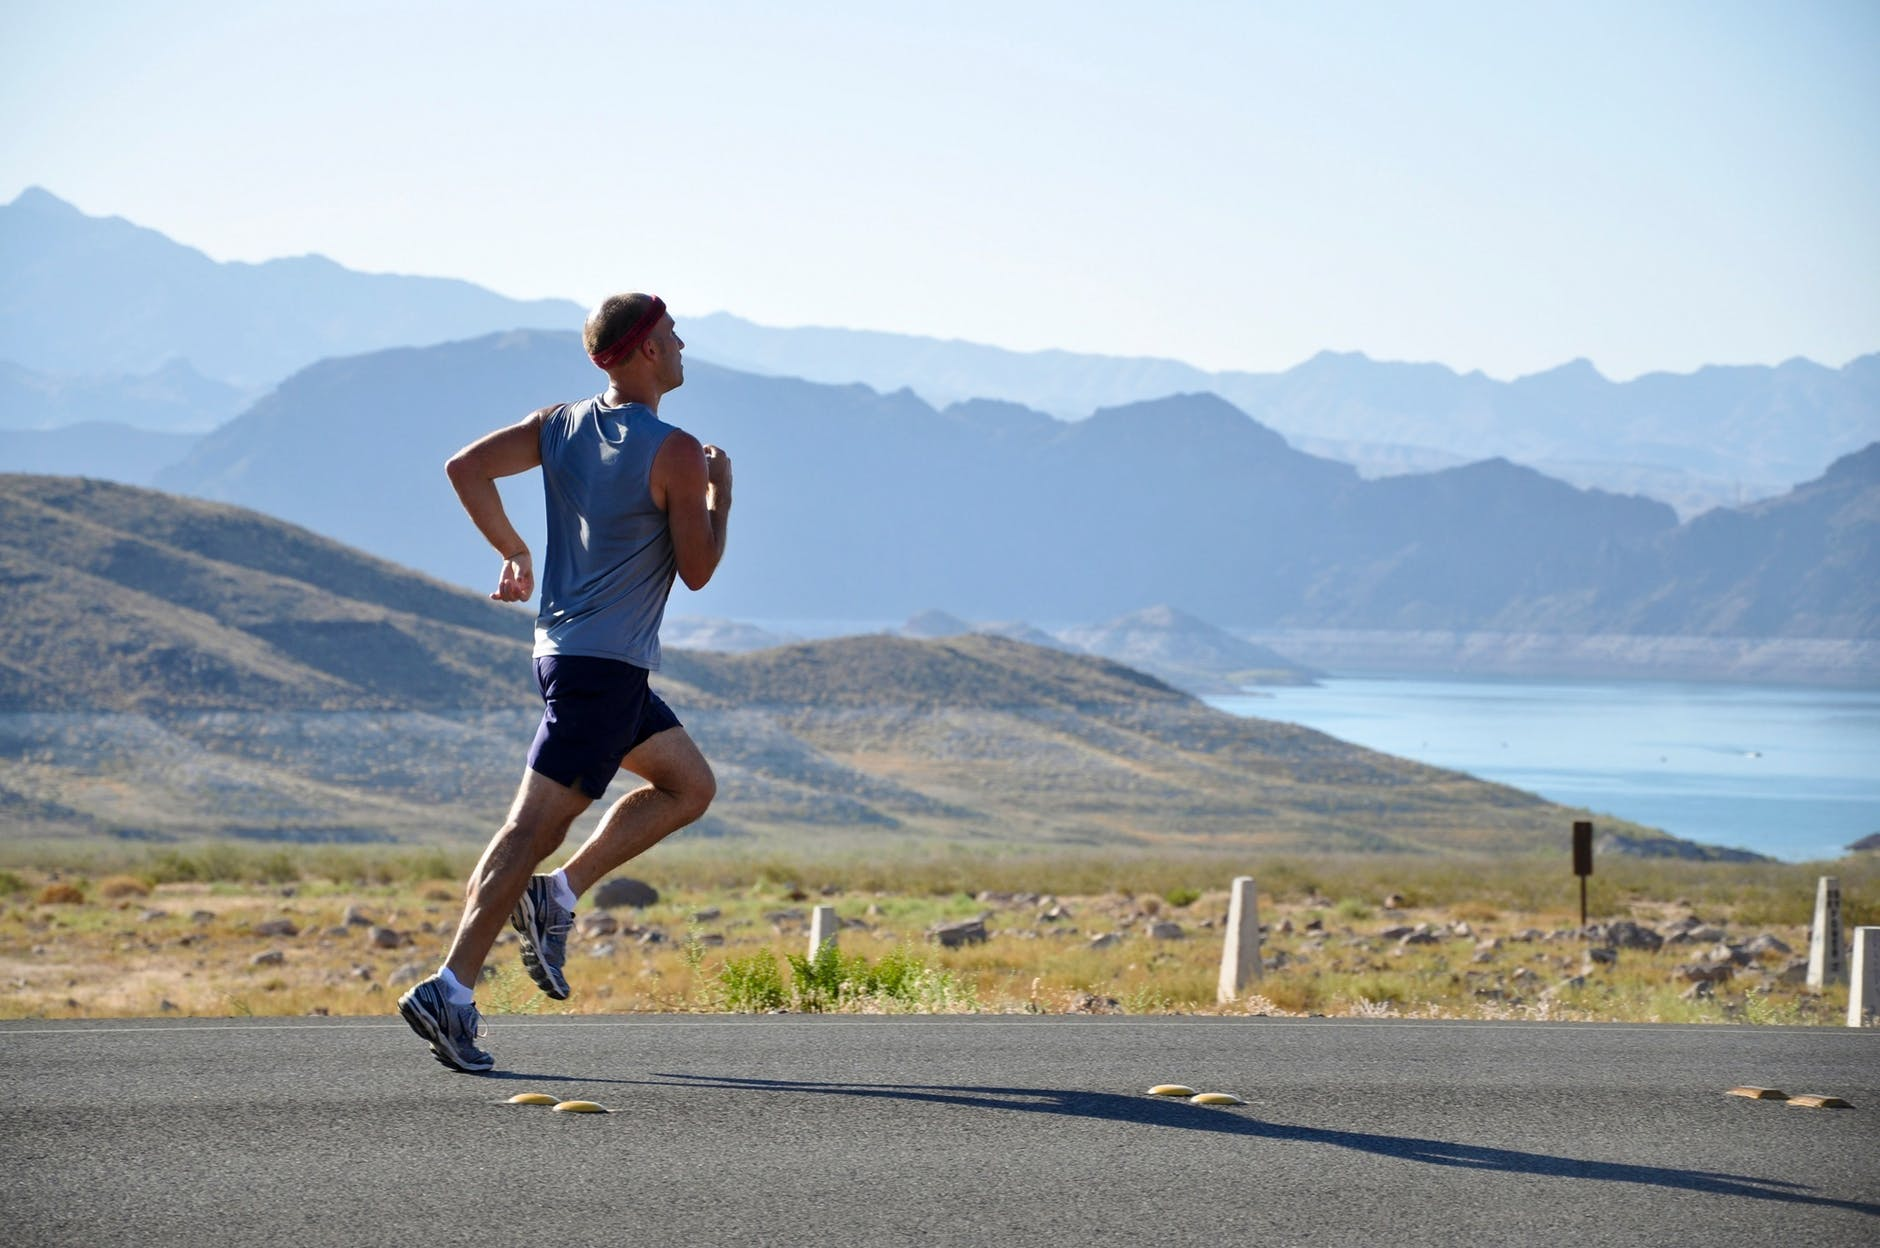 ahtlete running